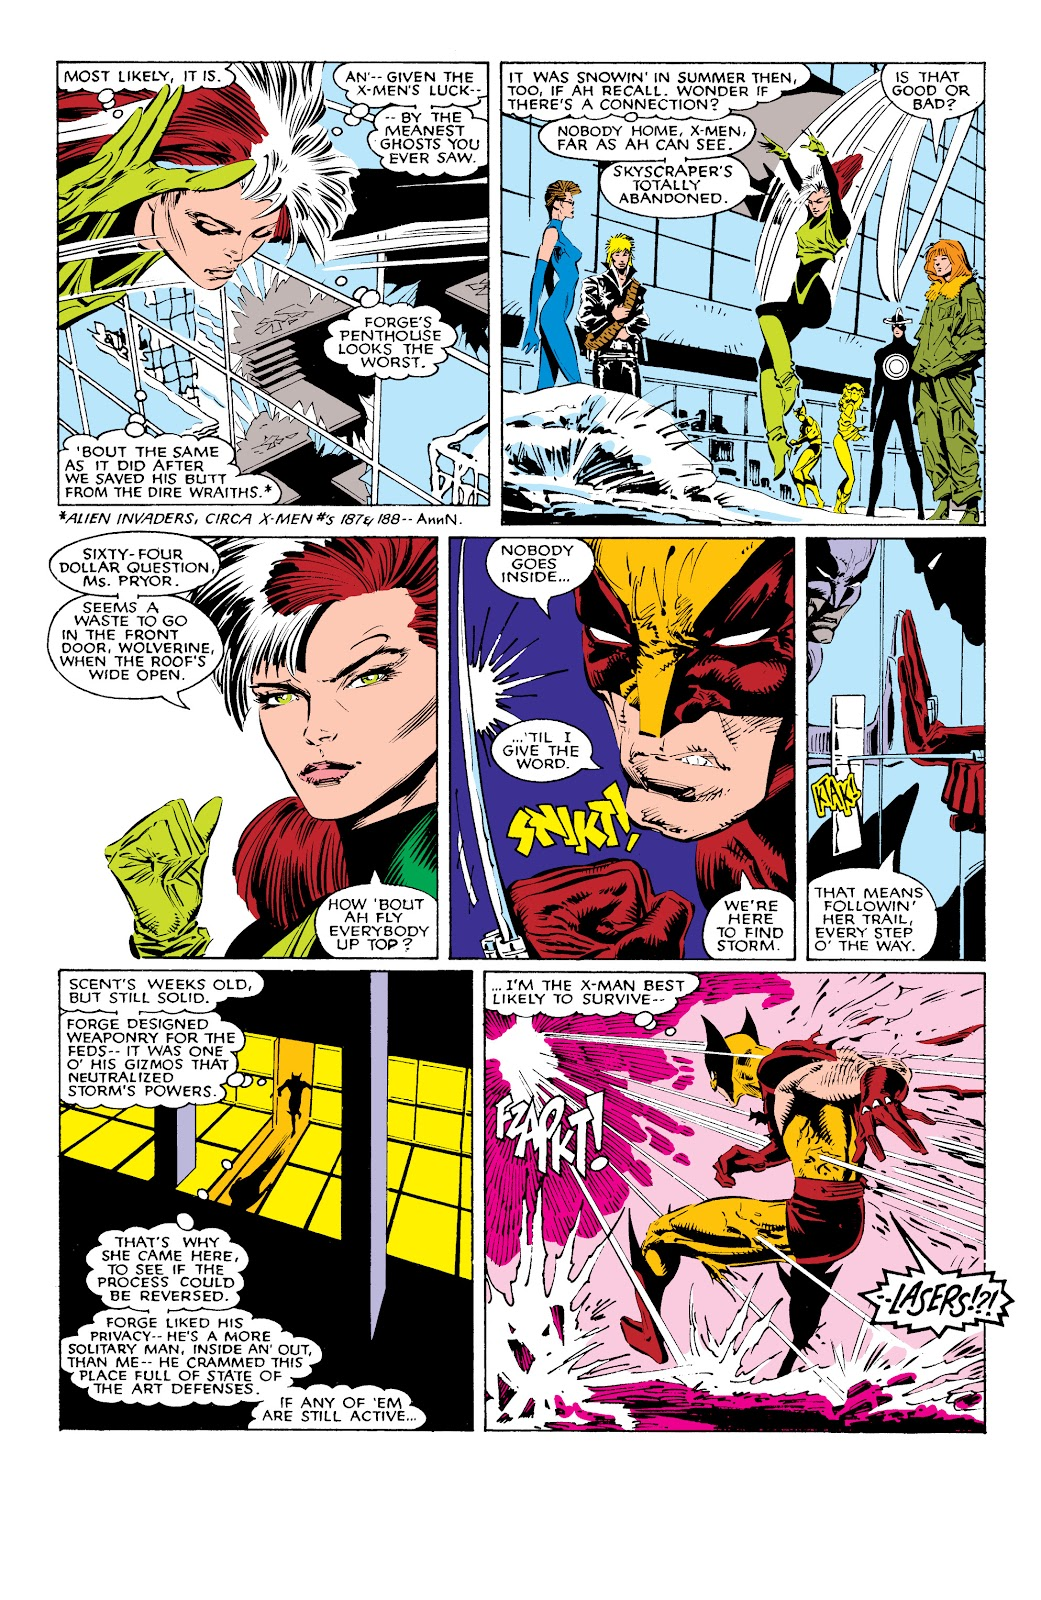 Read online X-Men Milestones: Fall of the Mutants comic -  Issue # TPB (Part 1) - 16